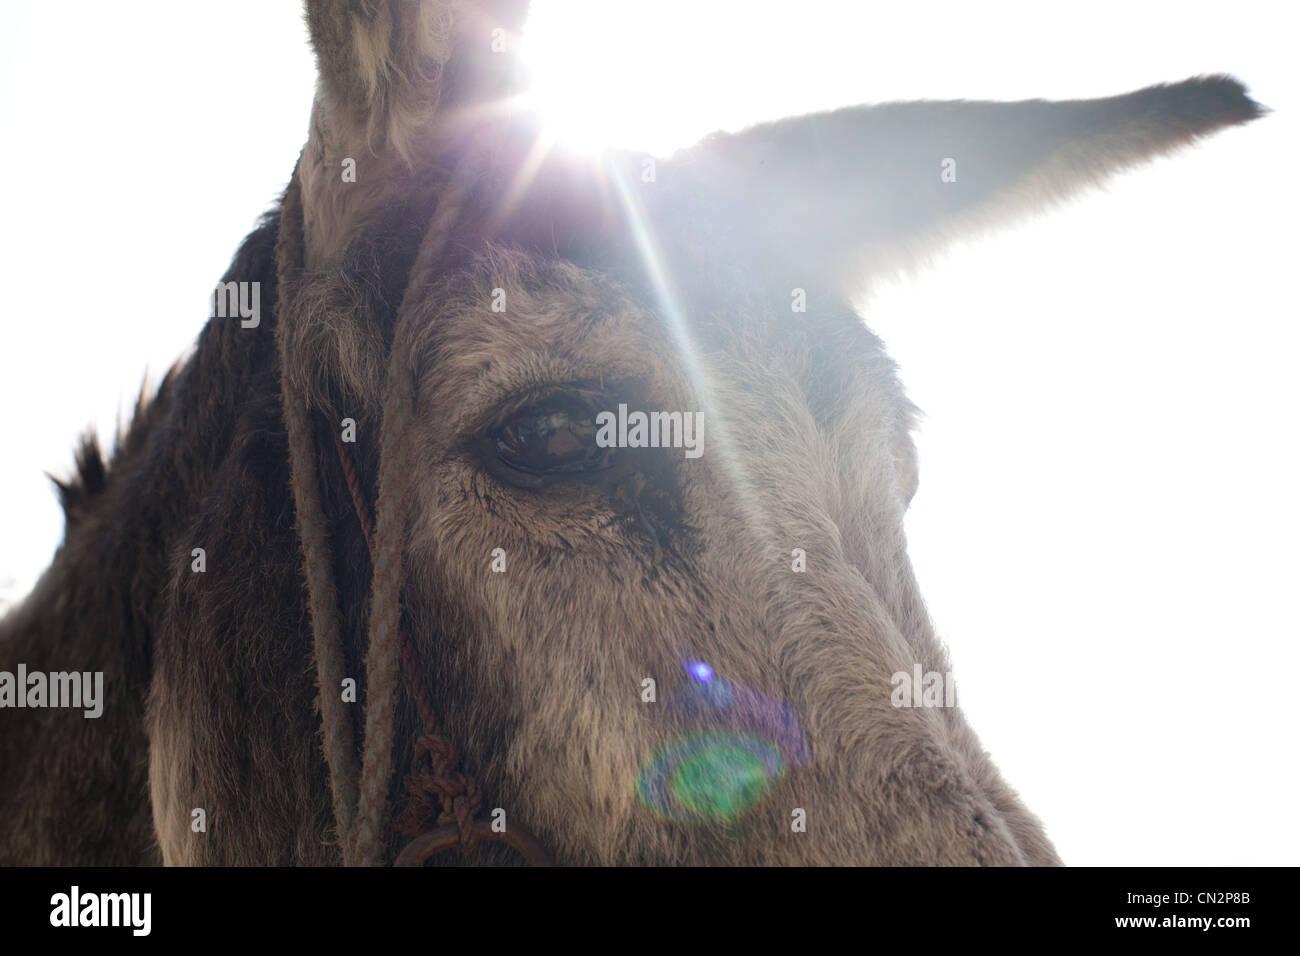 Testa d'asino era, close up Foto Stock